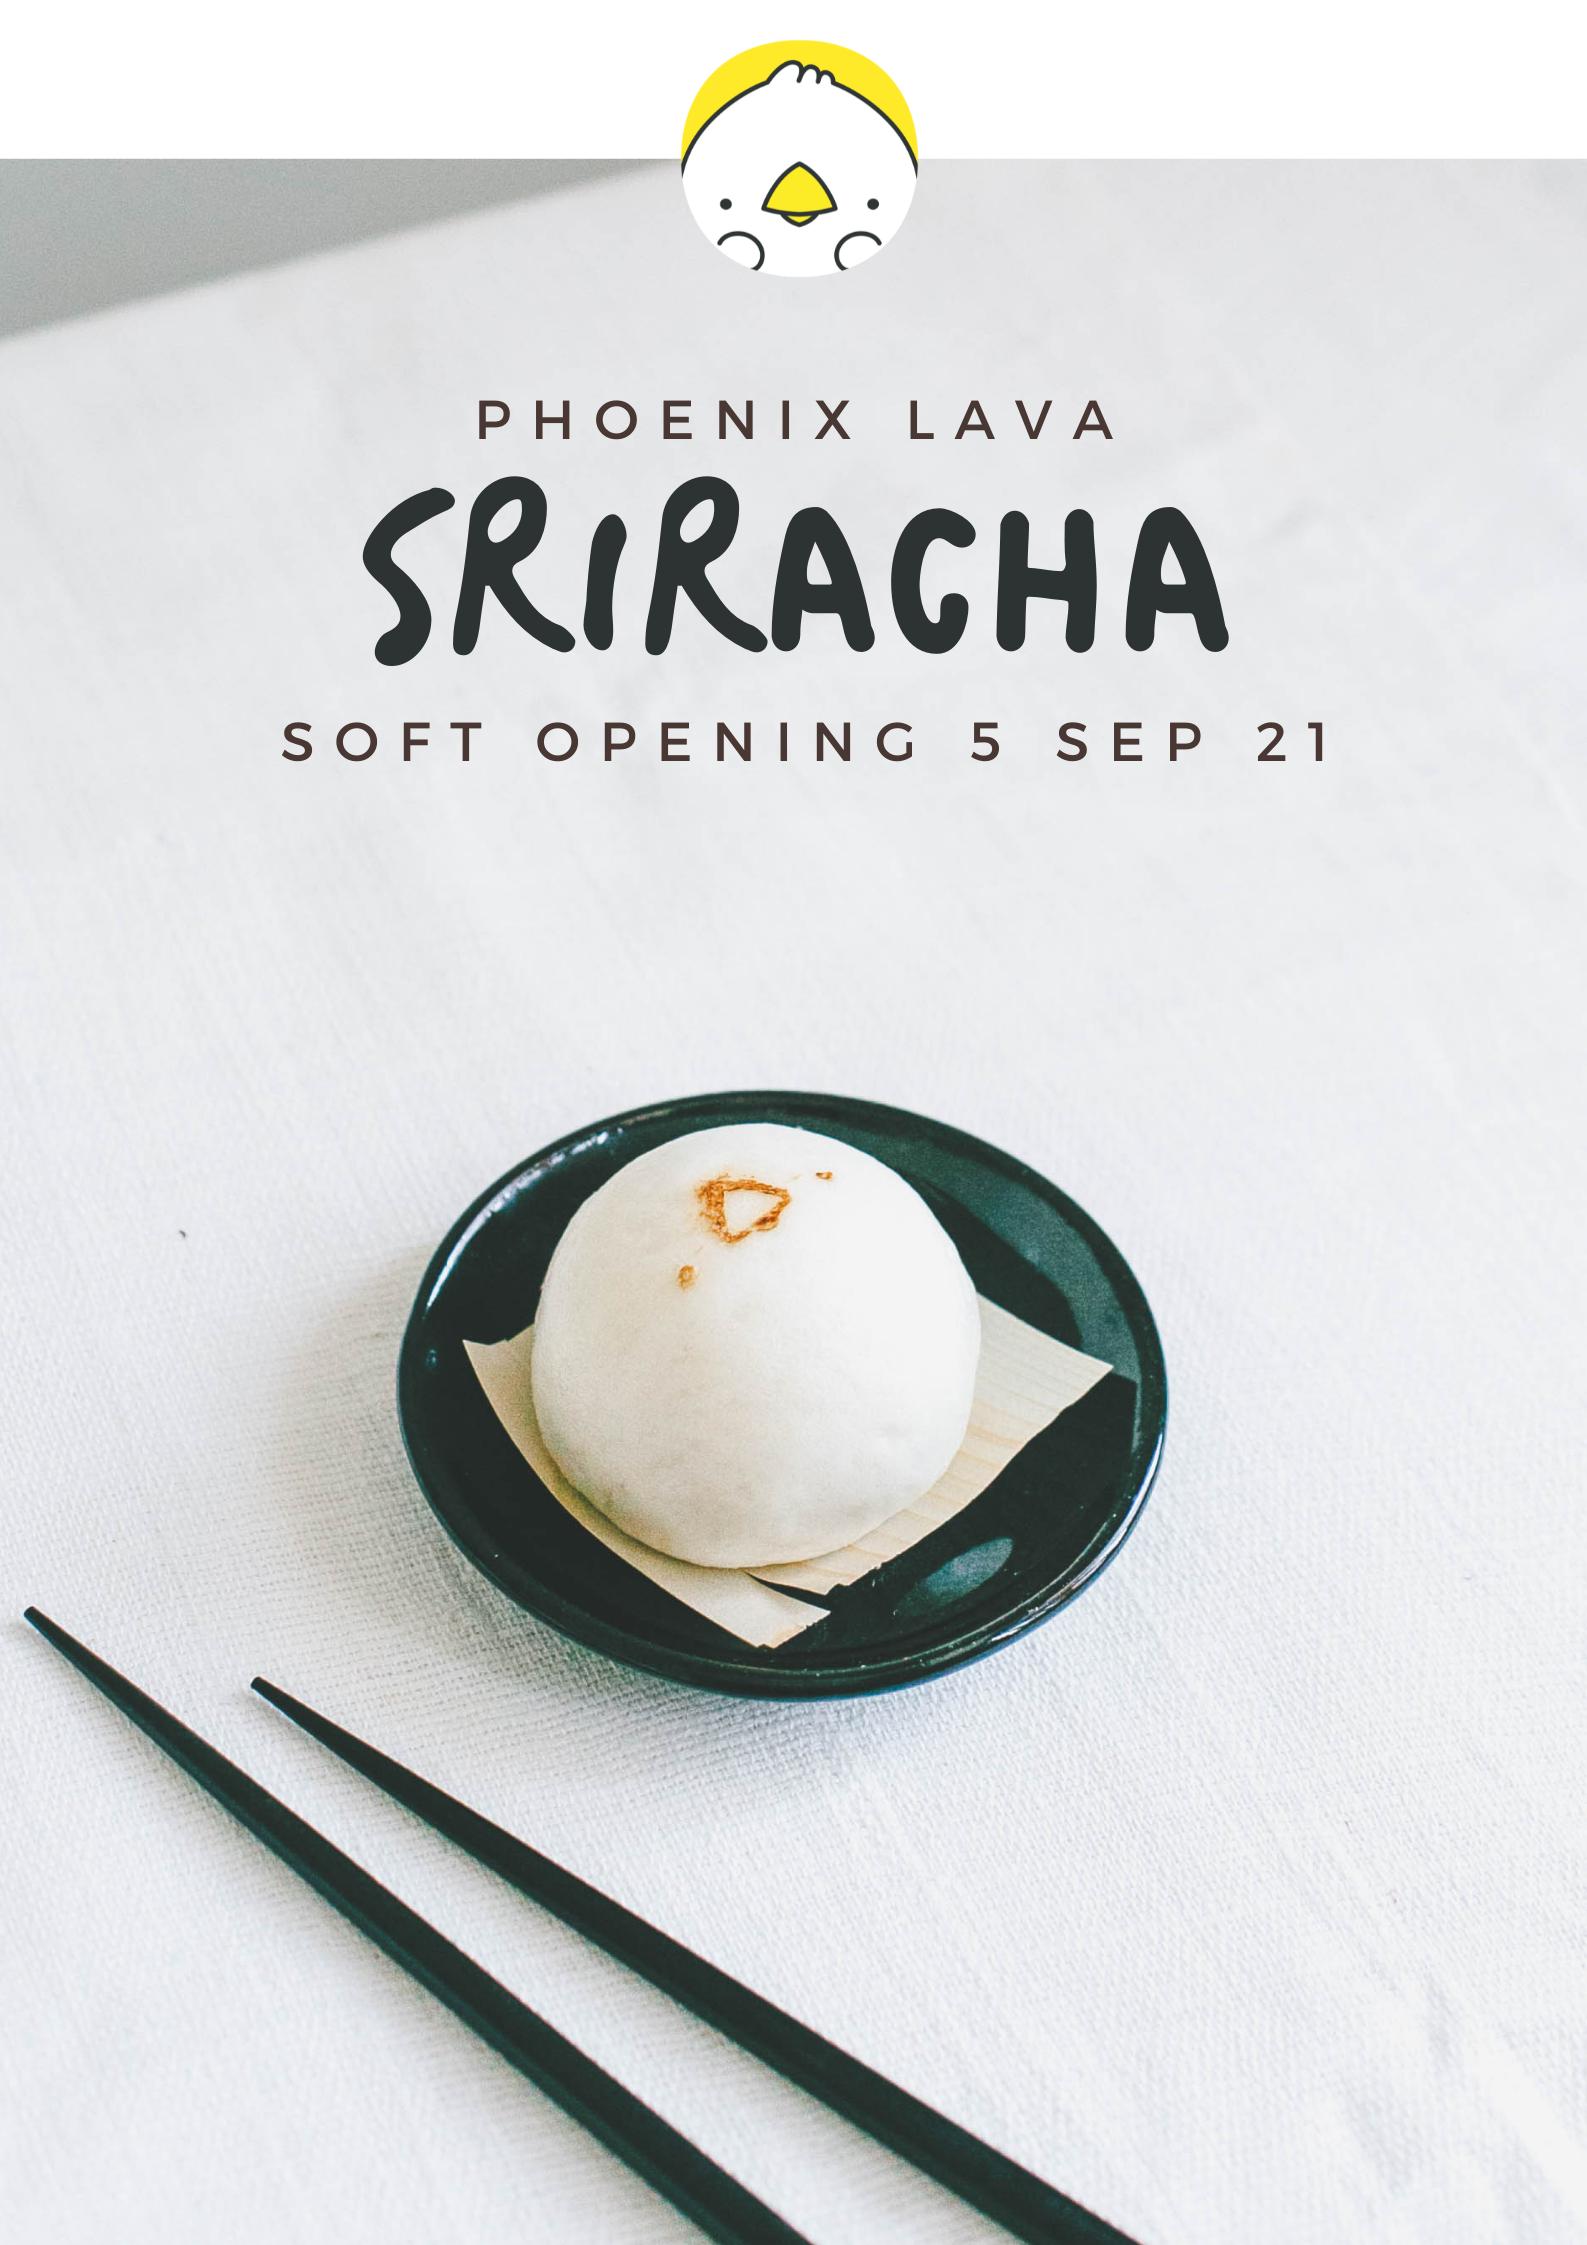 Phoenix Lava  J-Park Sriracha 日本むら。